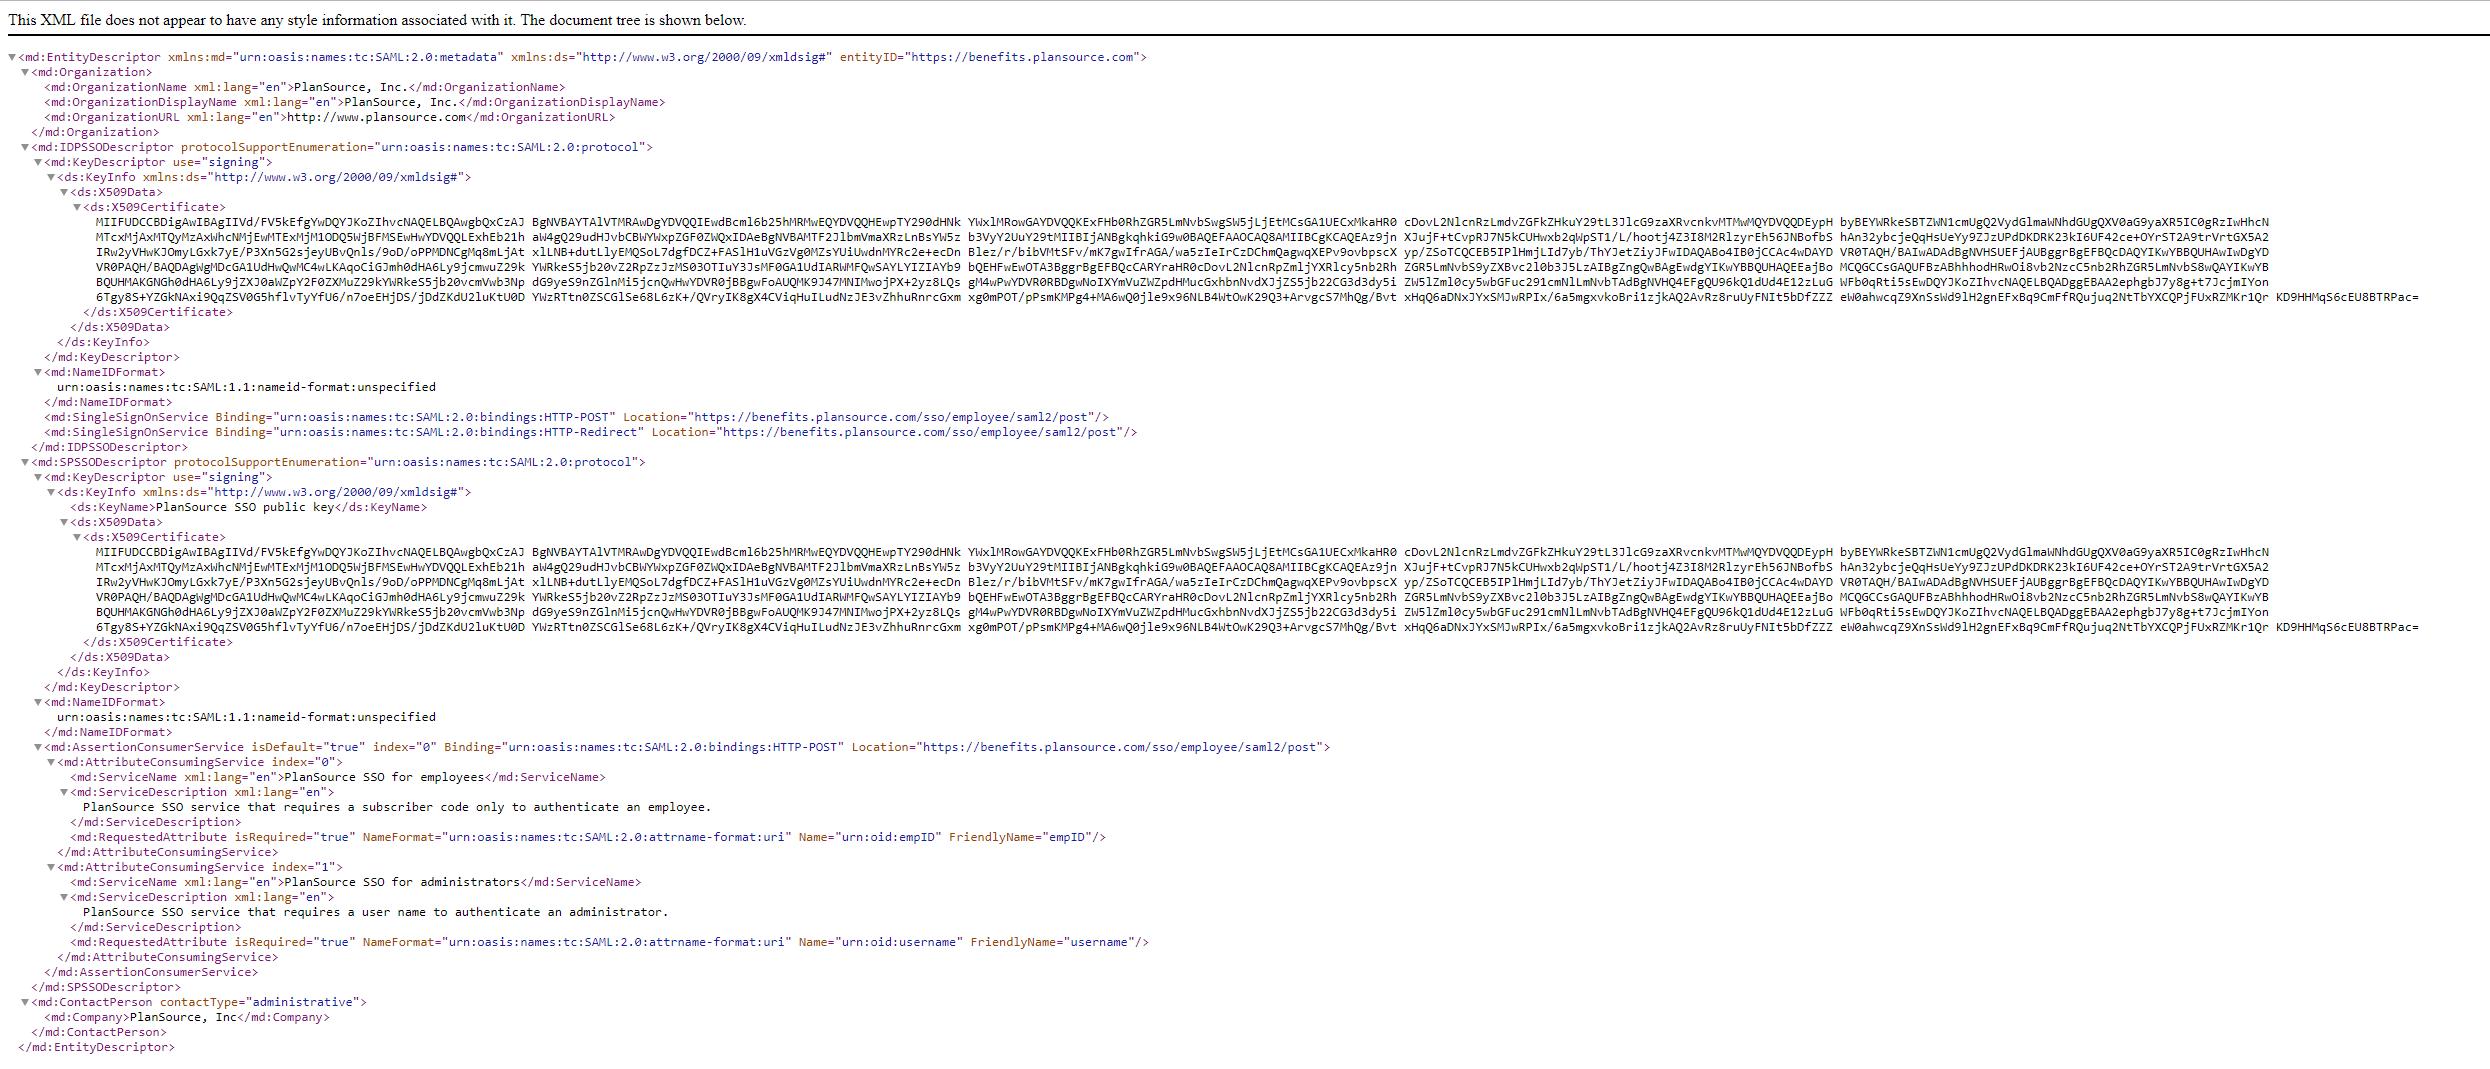 PlanSource SAML MetaData File